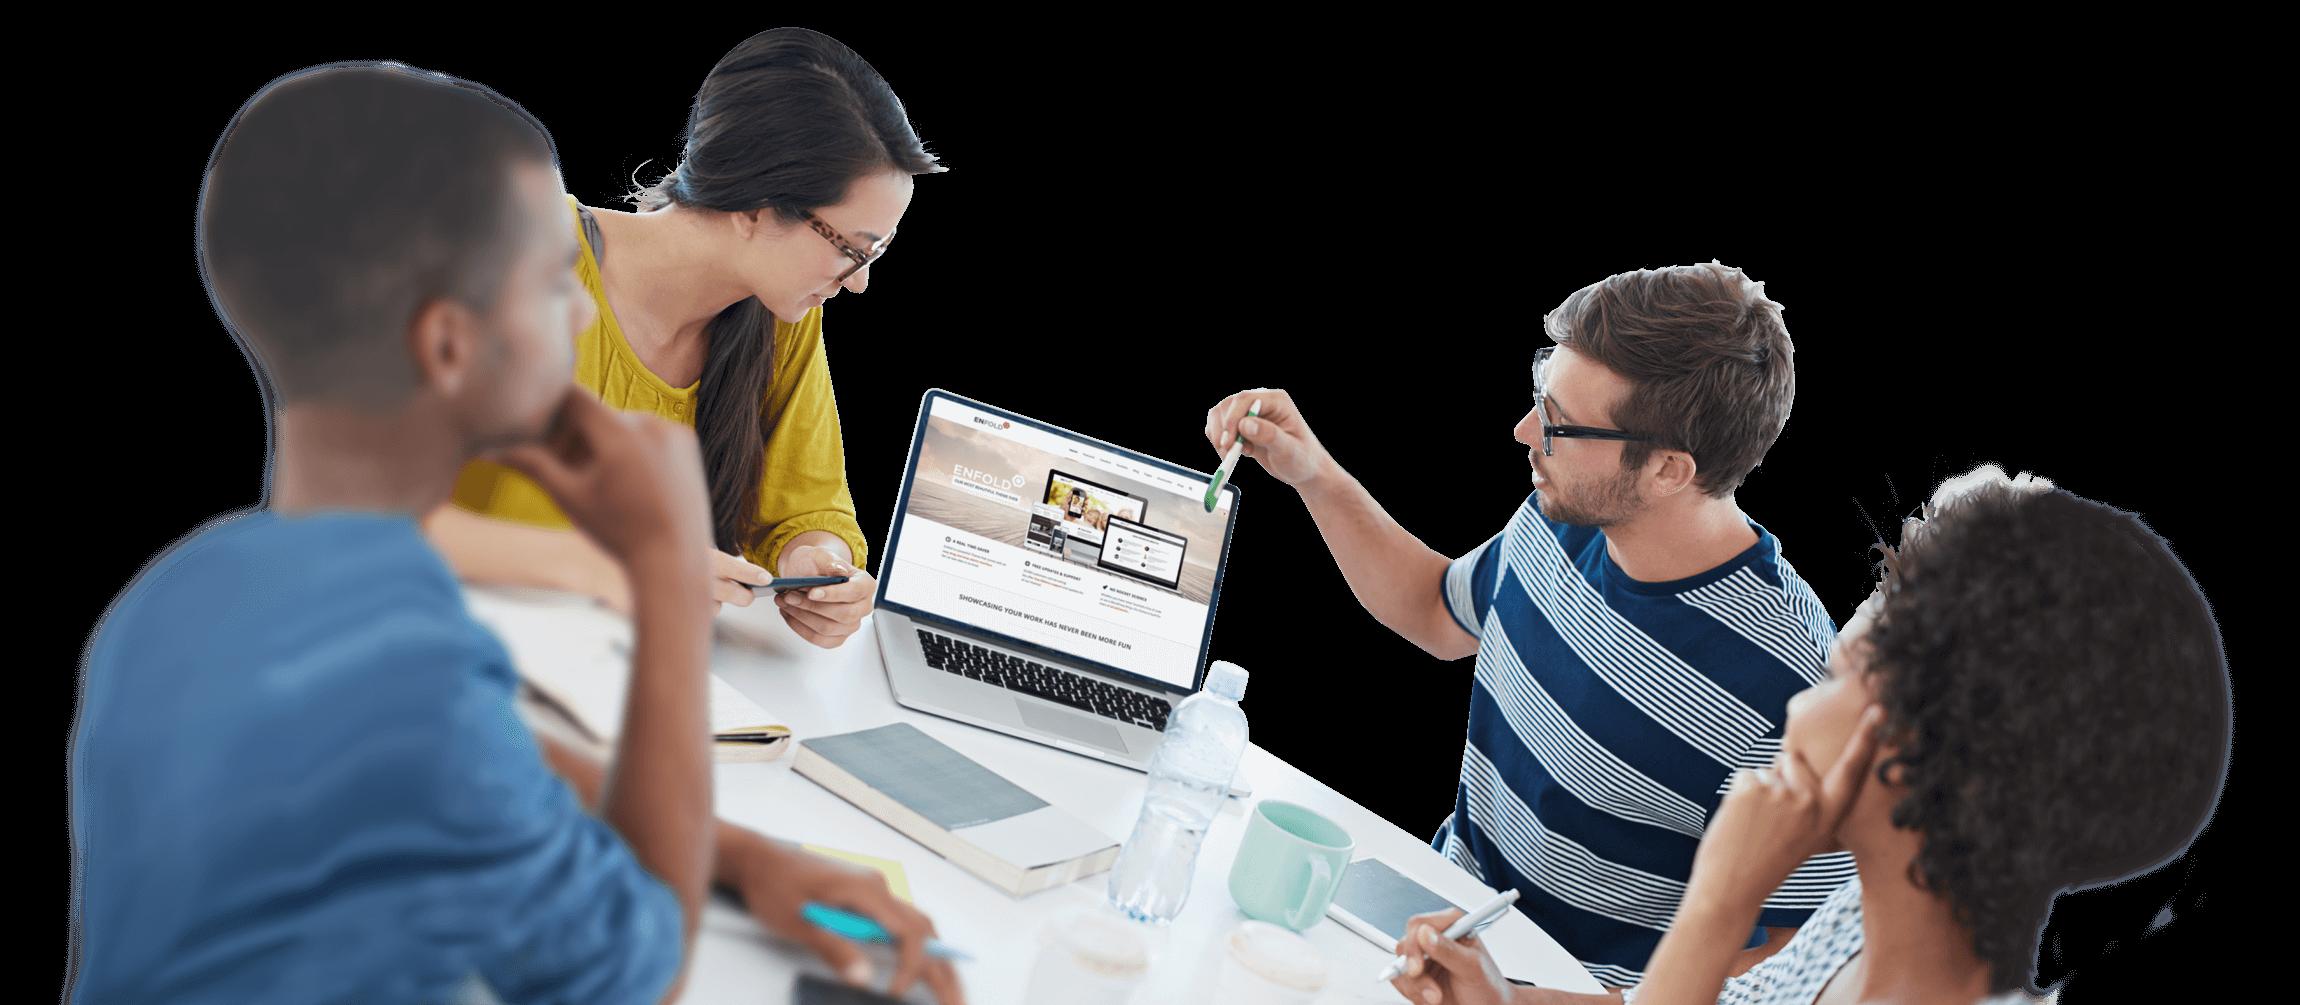 Expertise immobilière : Expert immobilier ou plateforme digitale ?